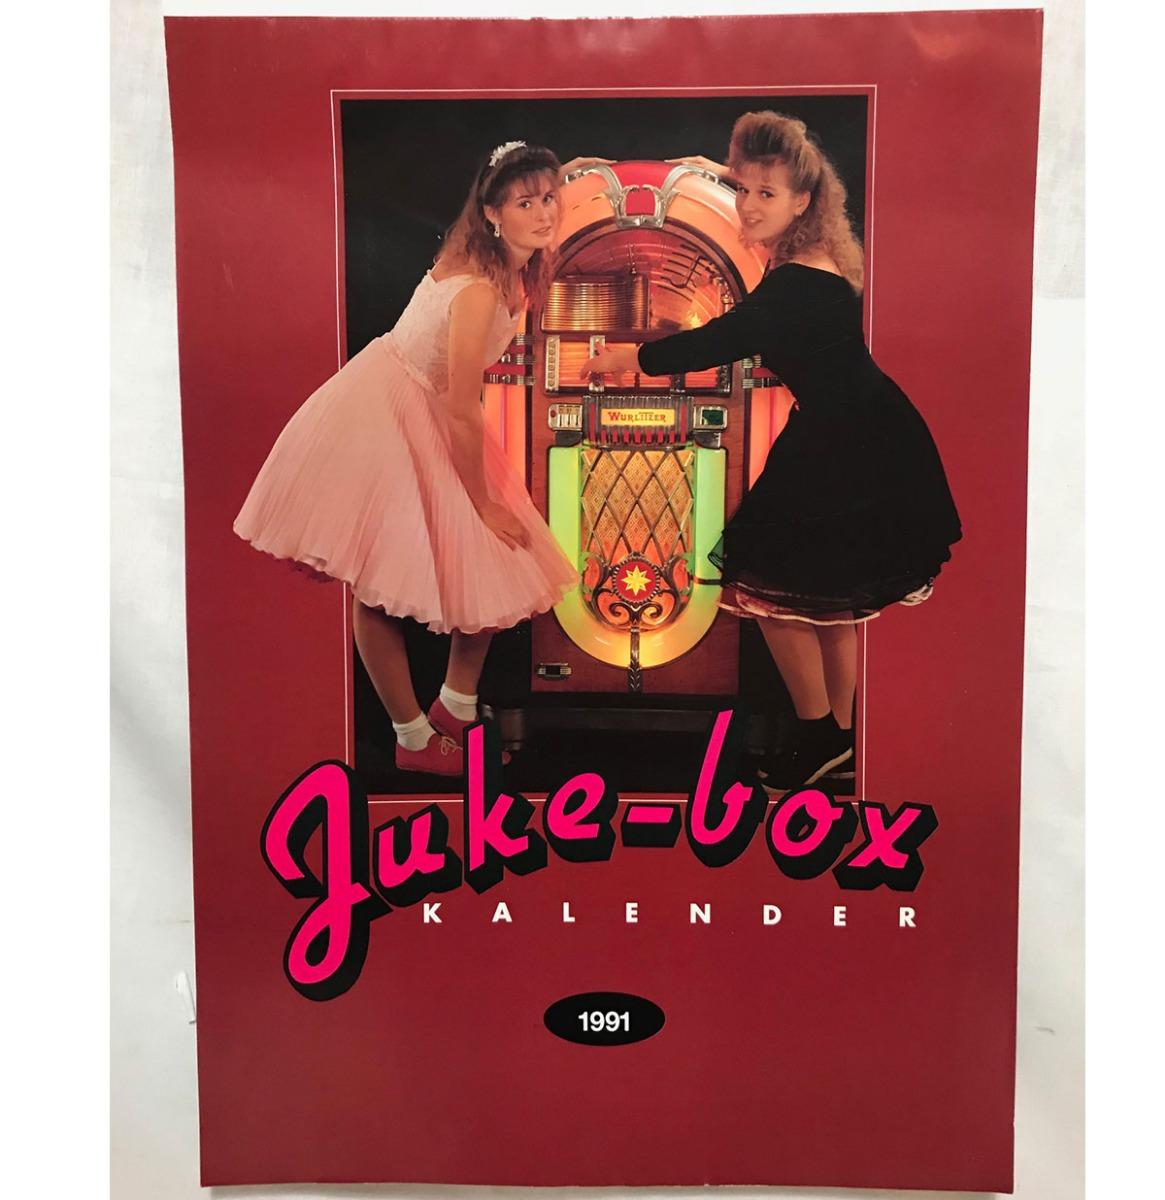 Jukebox Kalender Uit 1991